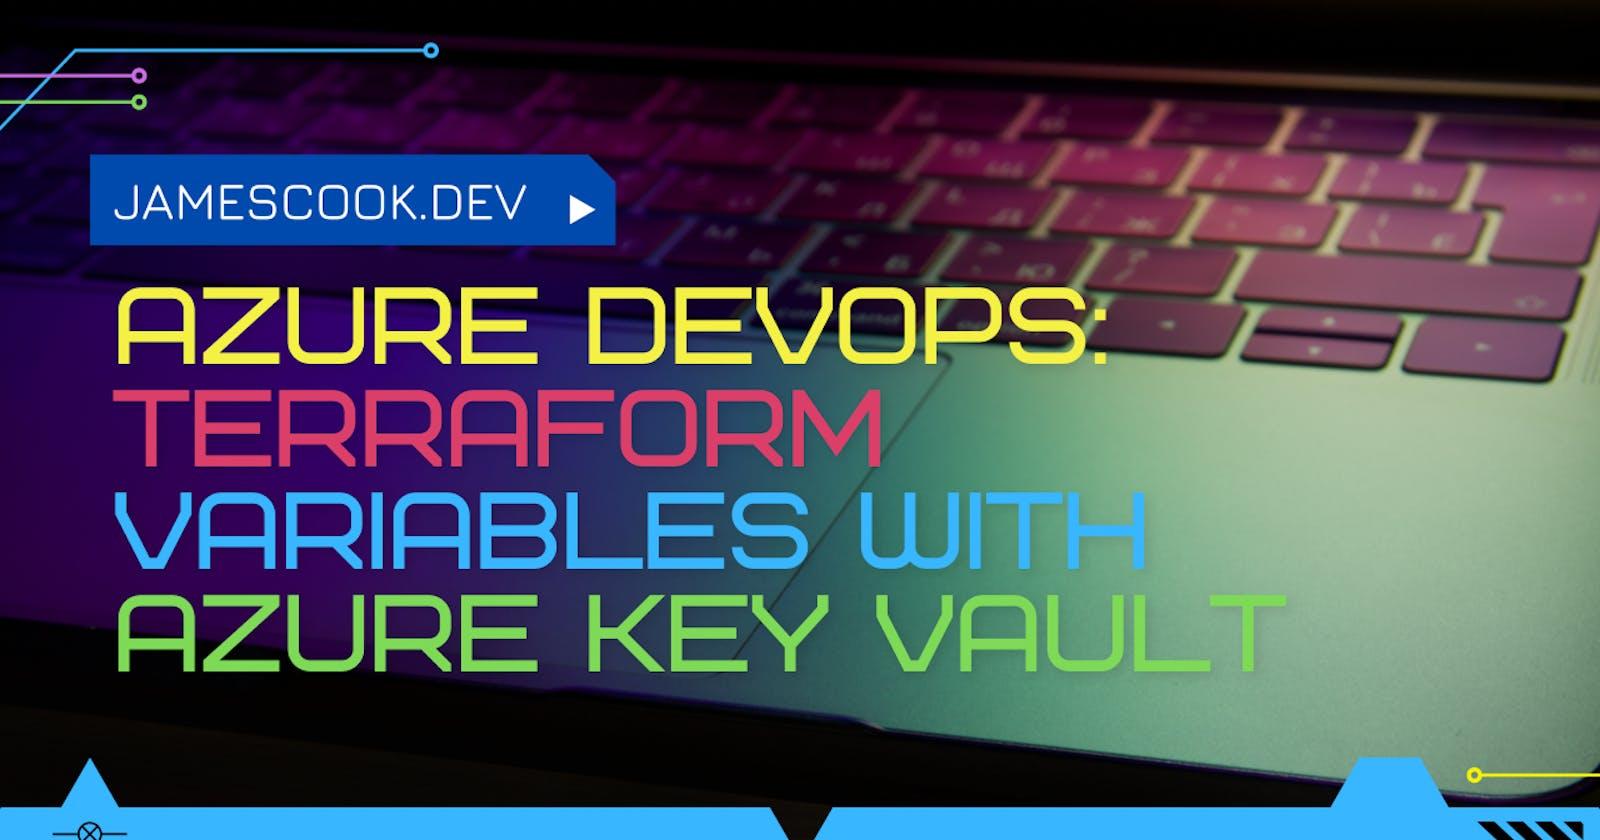 Azure DevOps: Terraform variables with Azure Key Vault